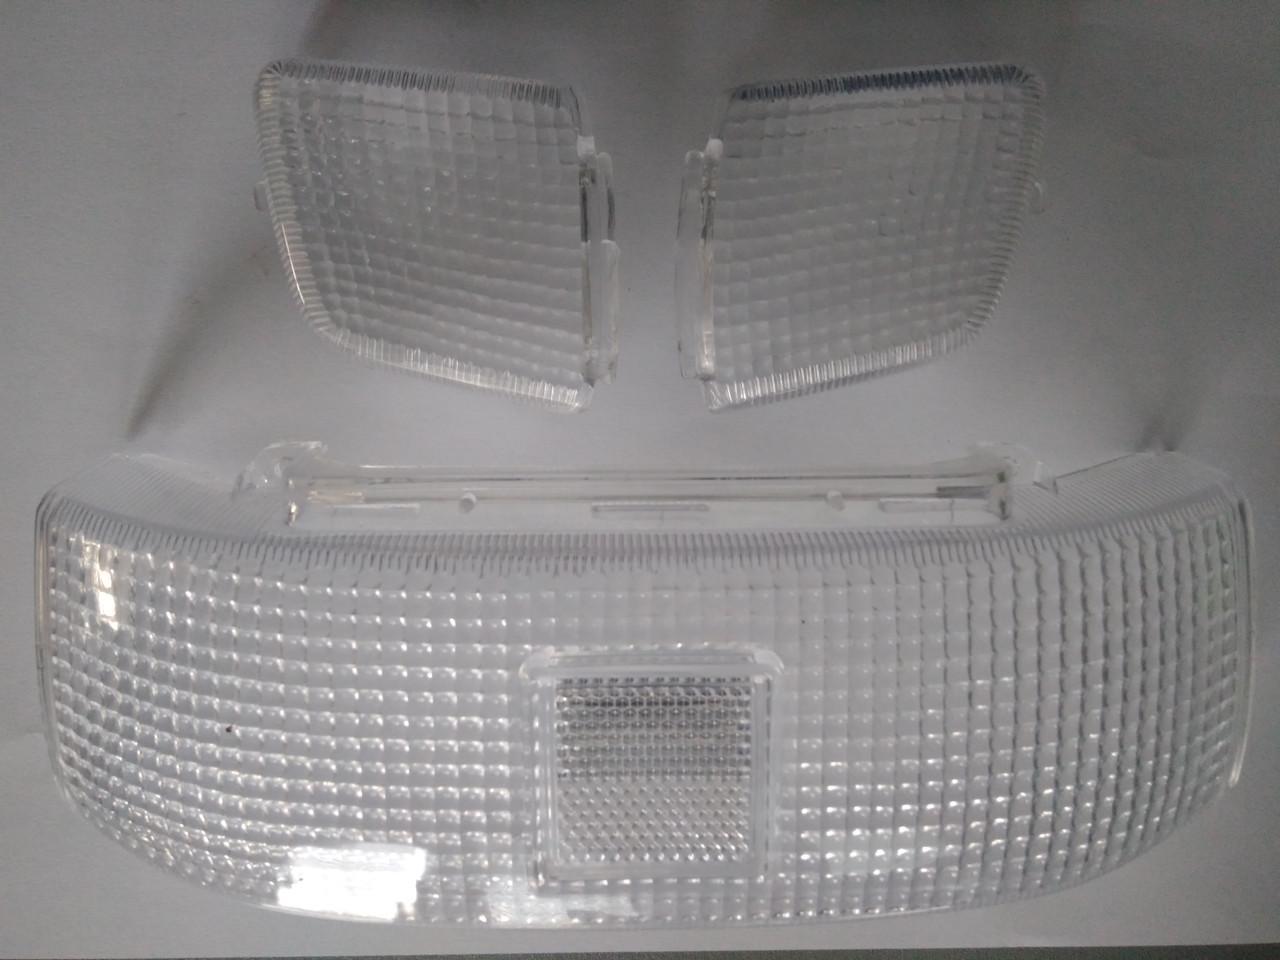 Стекло стоп-сигнала и поворотов HONDA LEAD (белые стекла)